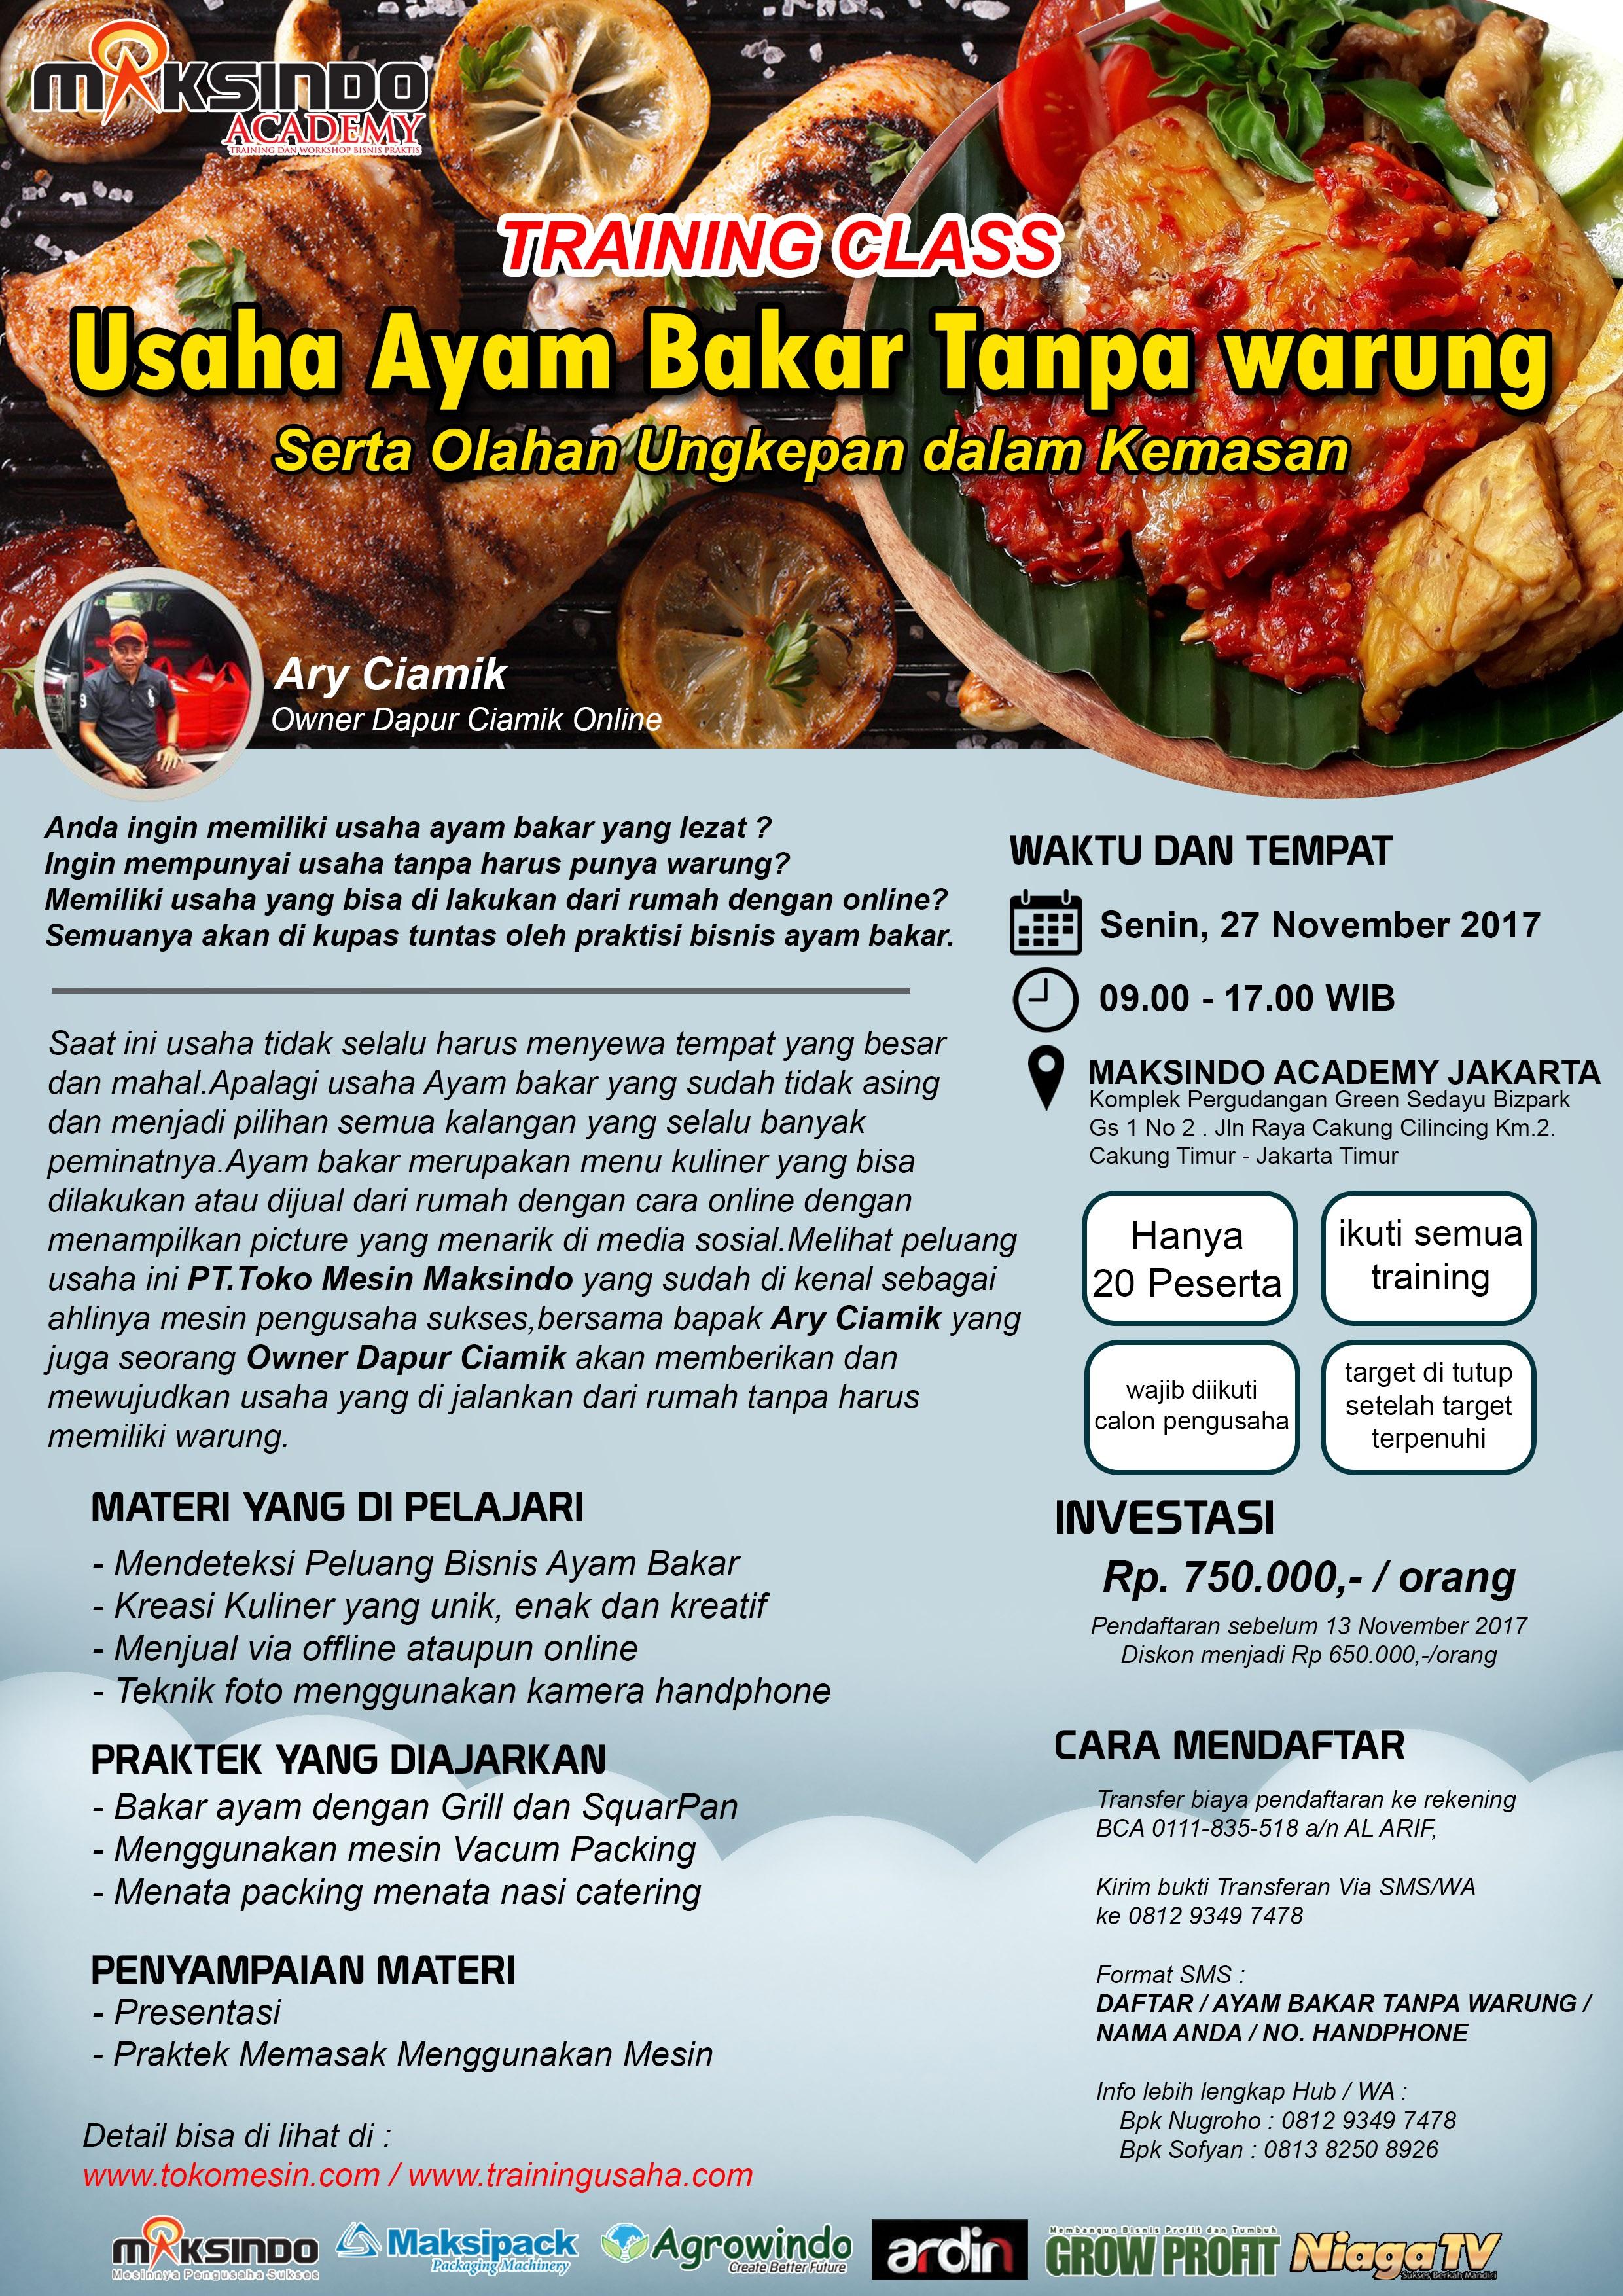 Training Usaha Ayam Bakar Tanpa Bawang, 27 November 2017